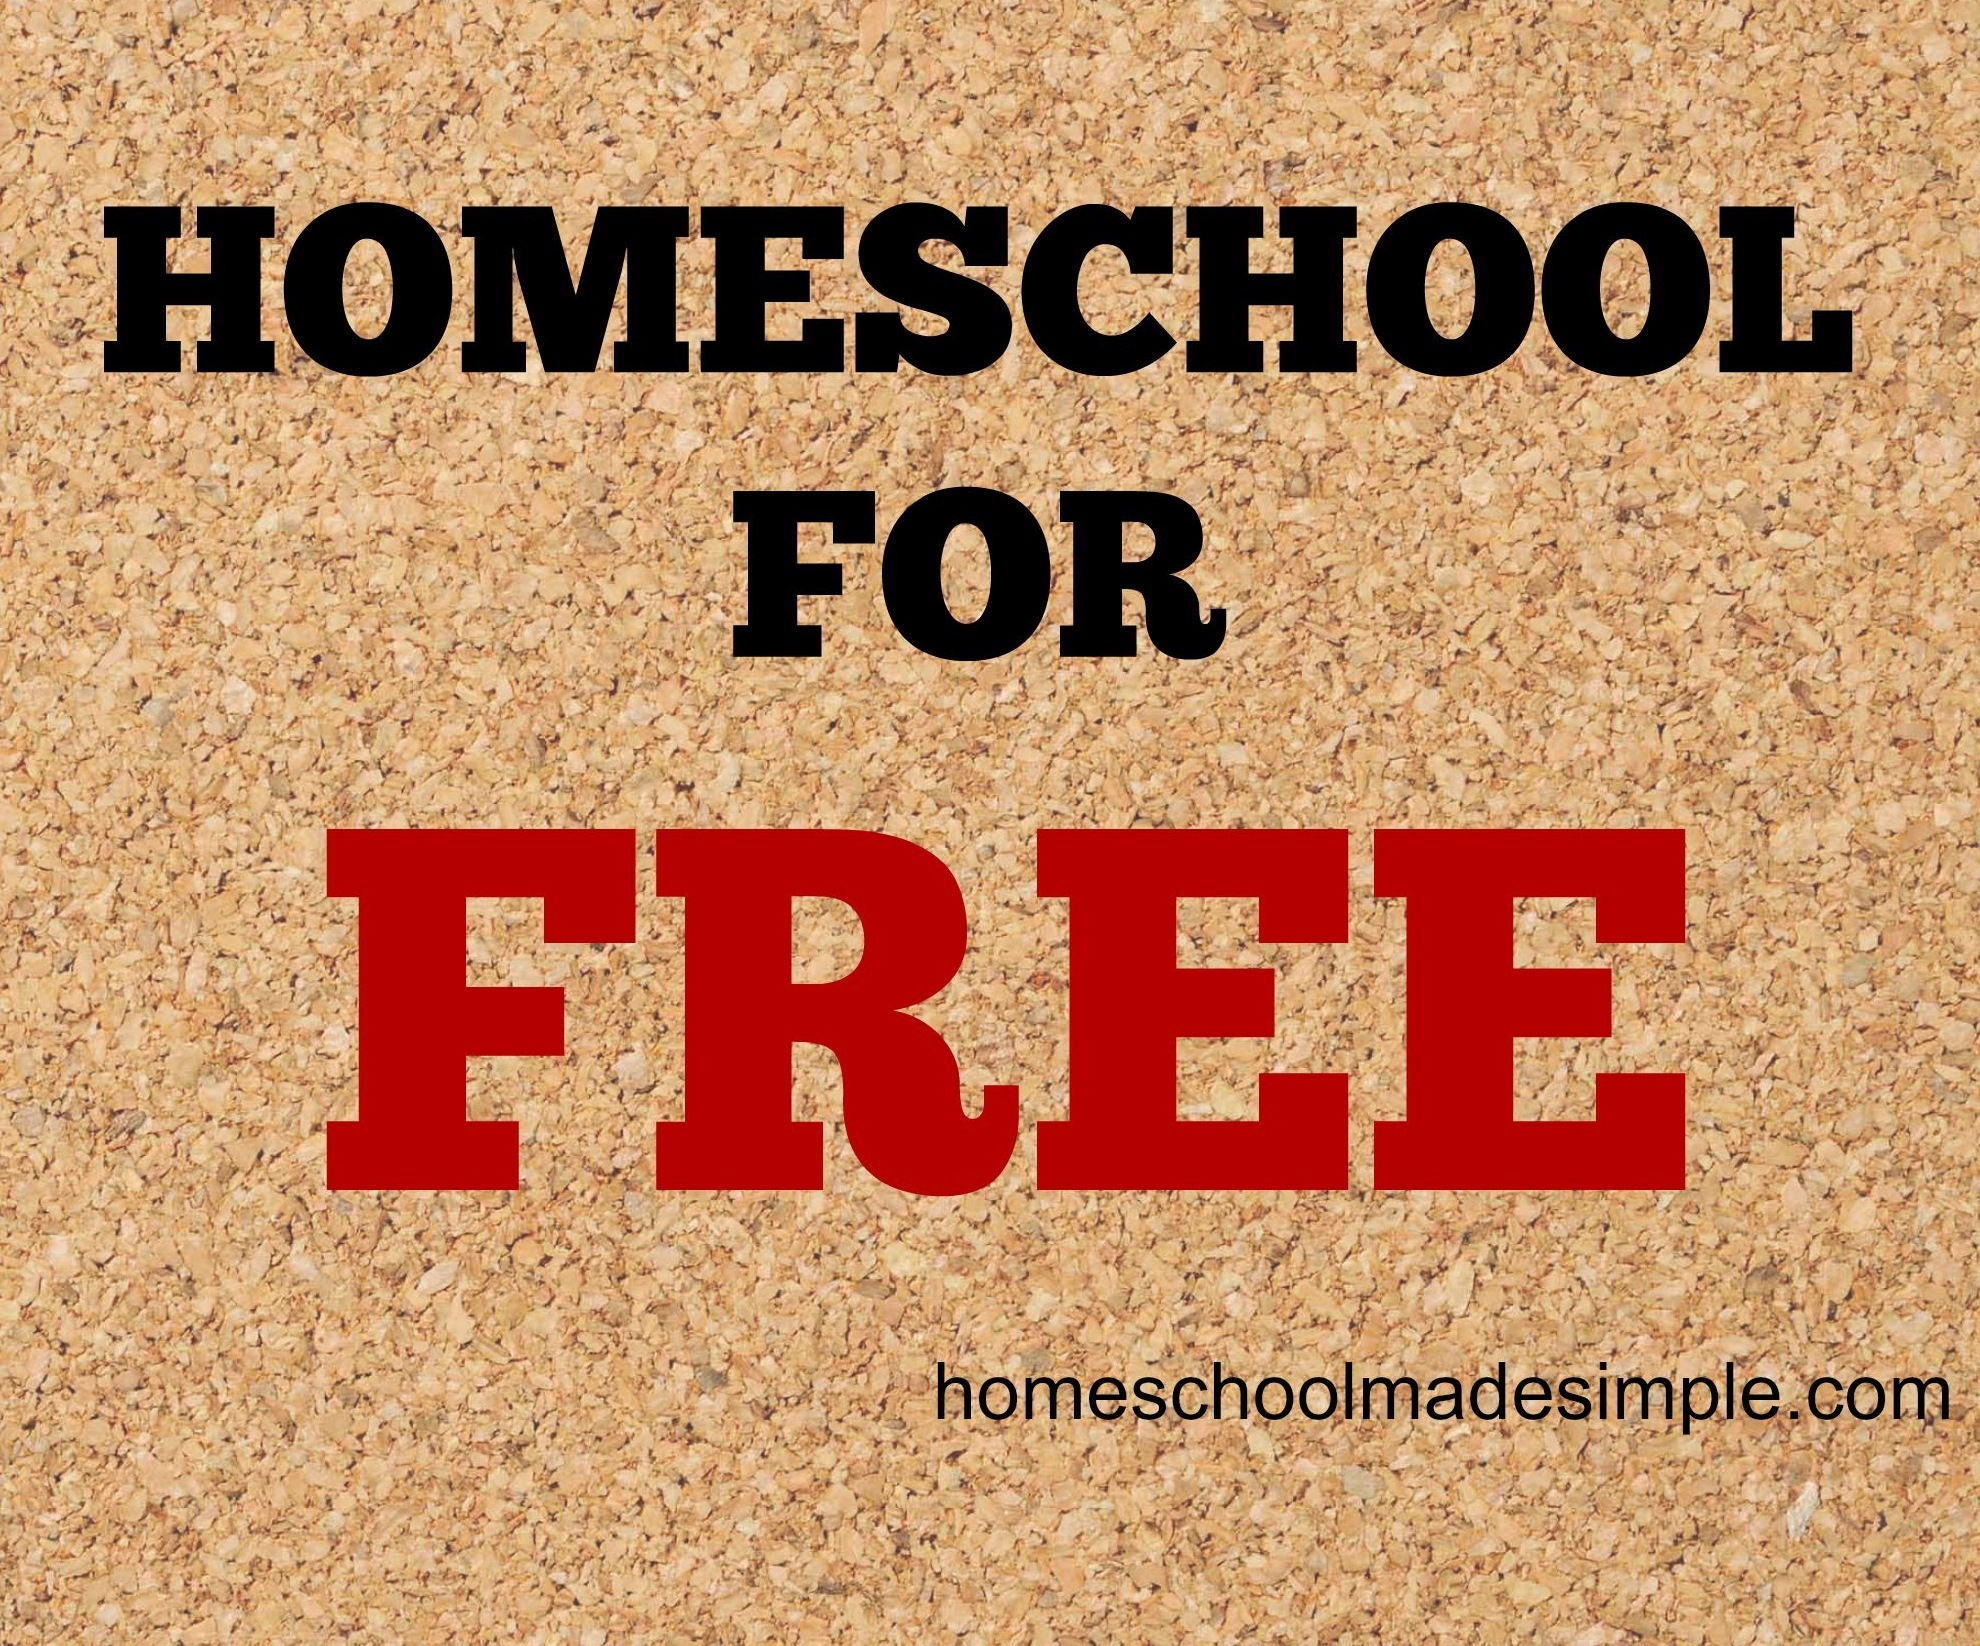 Tag/homeschooling families - Free Online Homeschooling K12